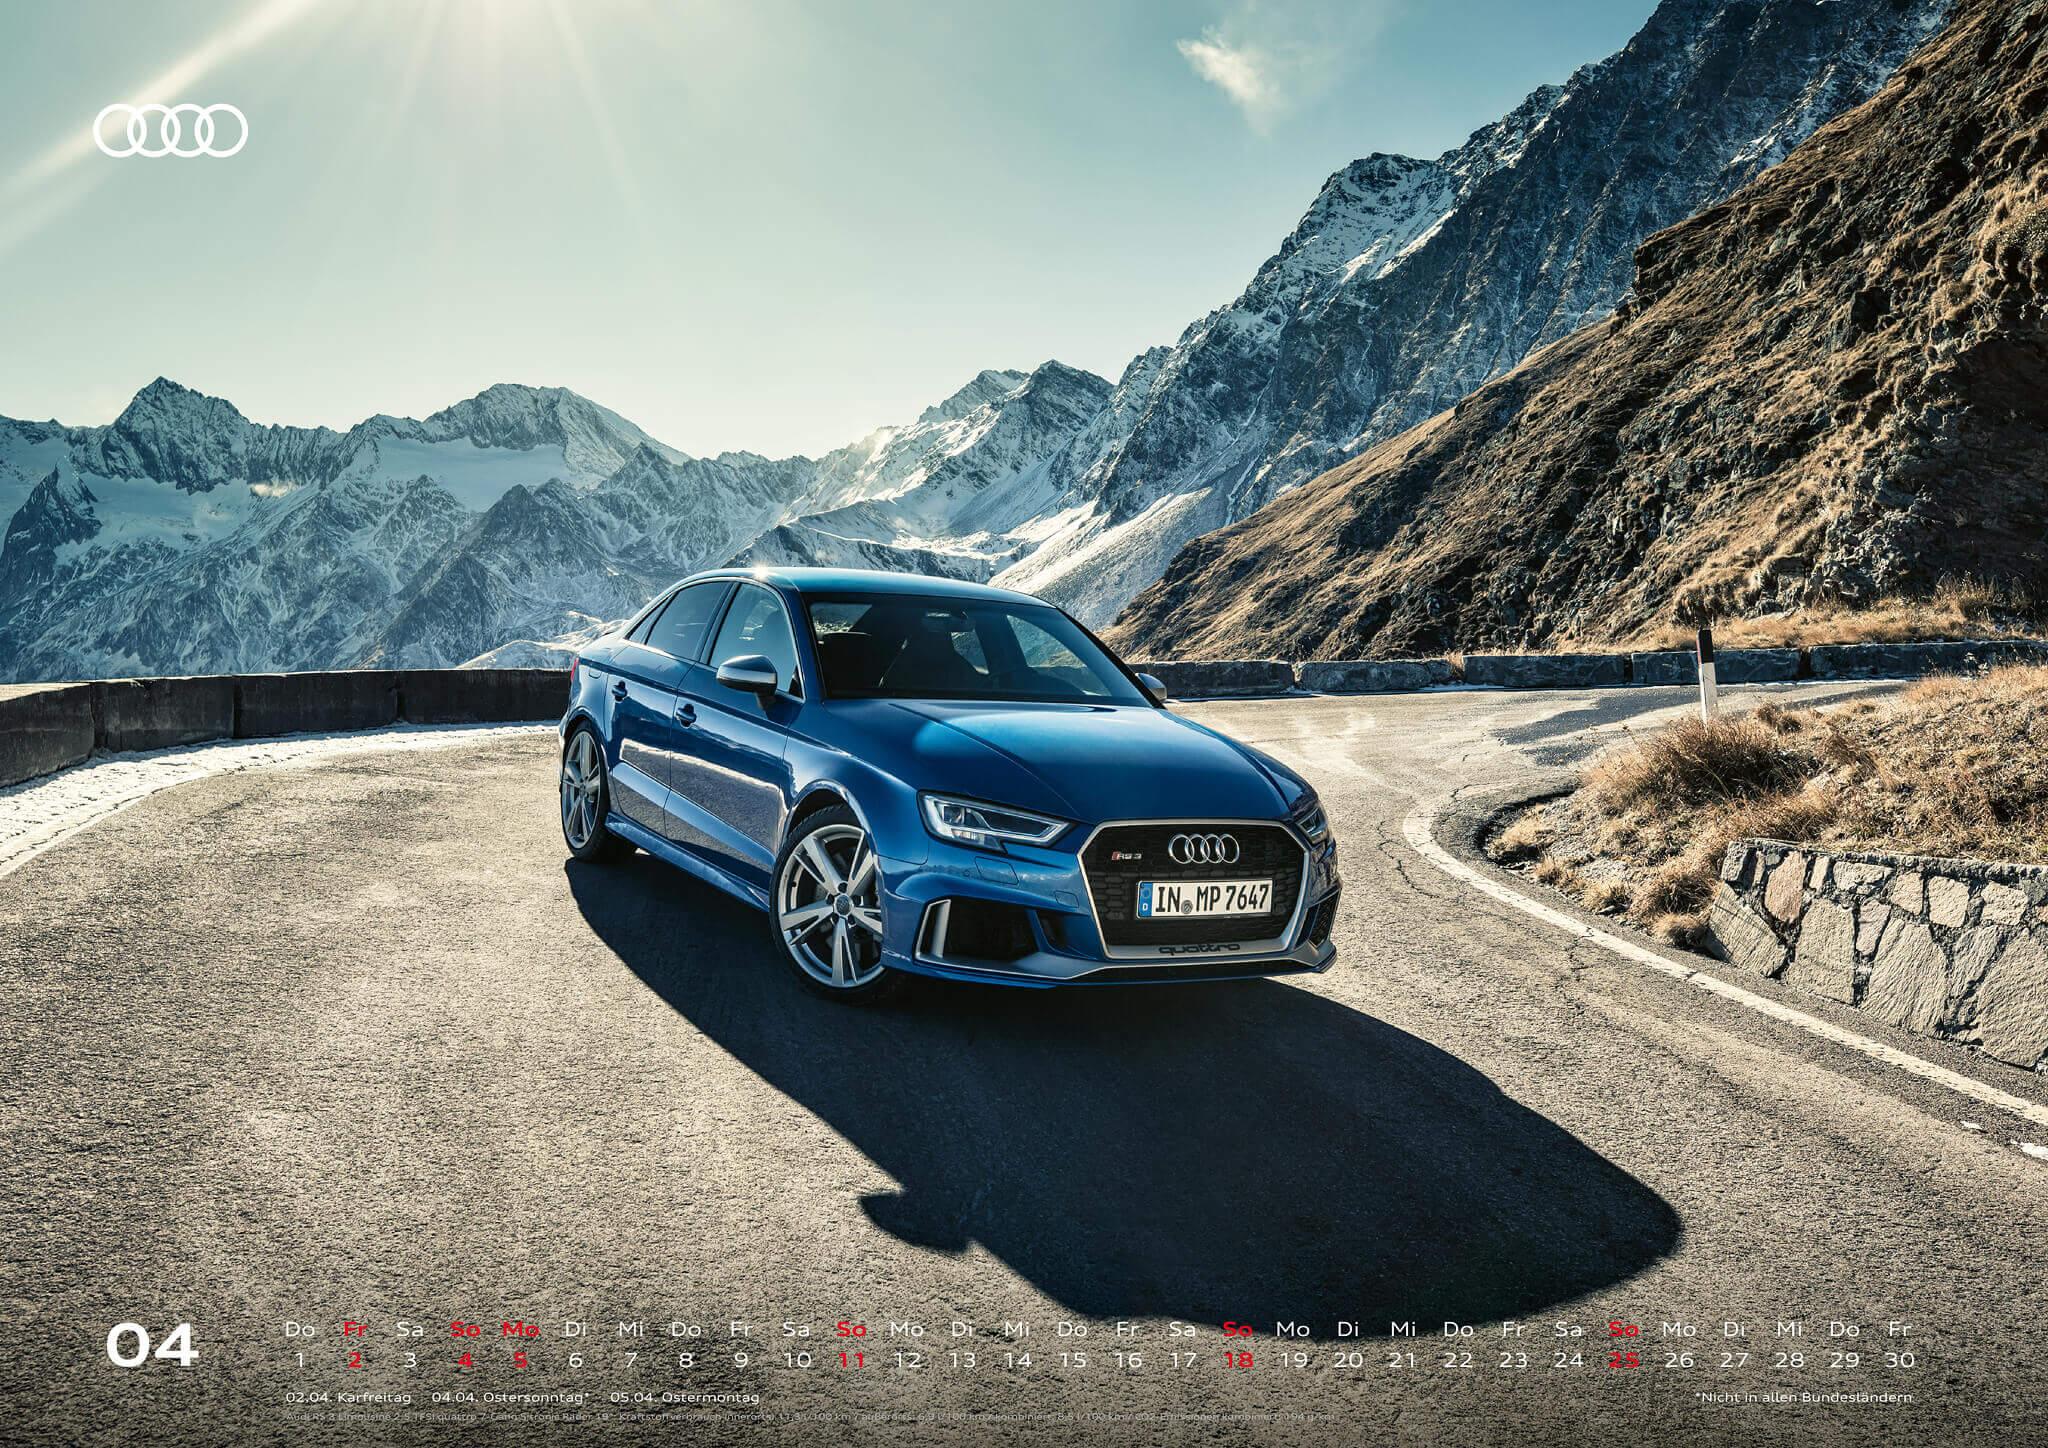 Audi Kalender 2021 - DIN A2 / Audi RS3 Limousine